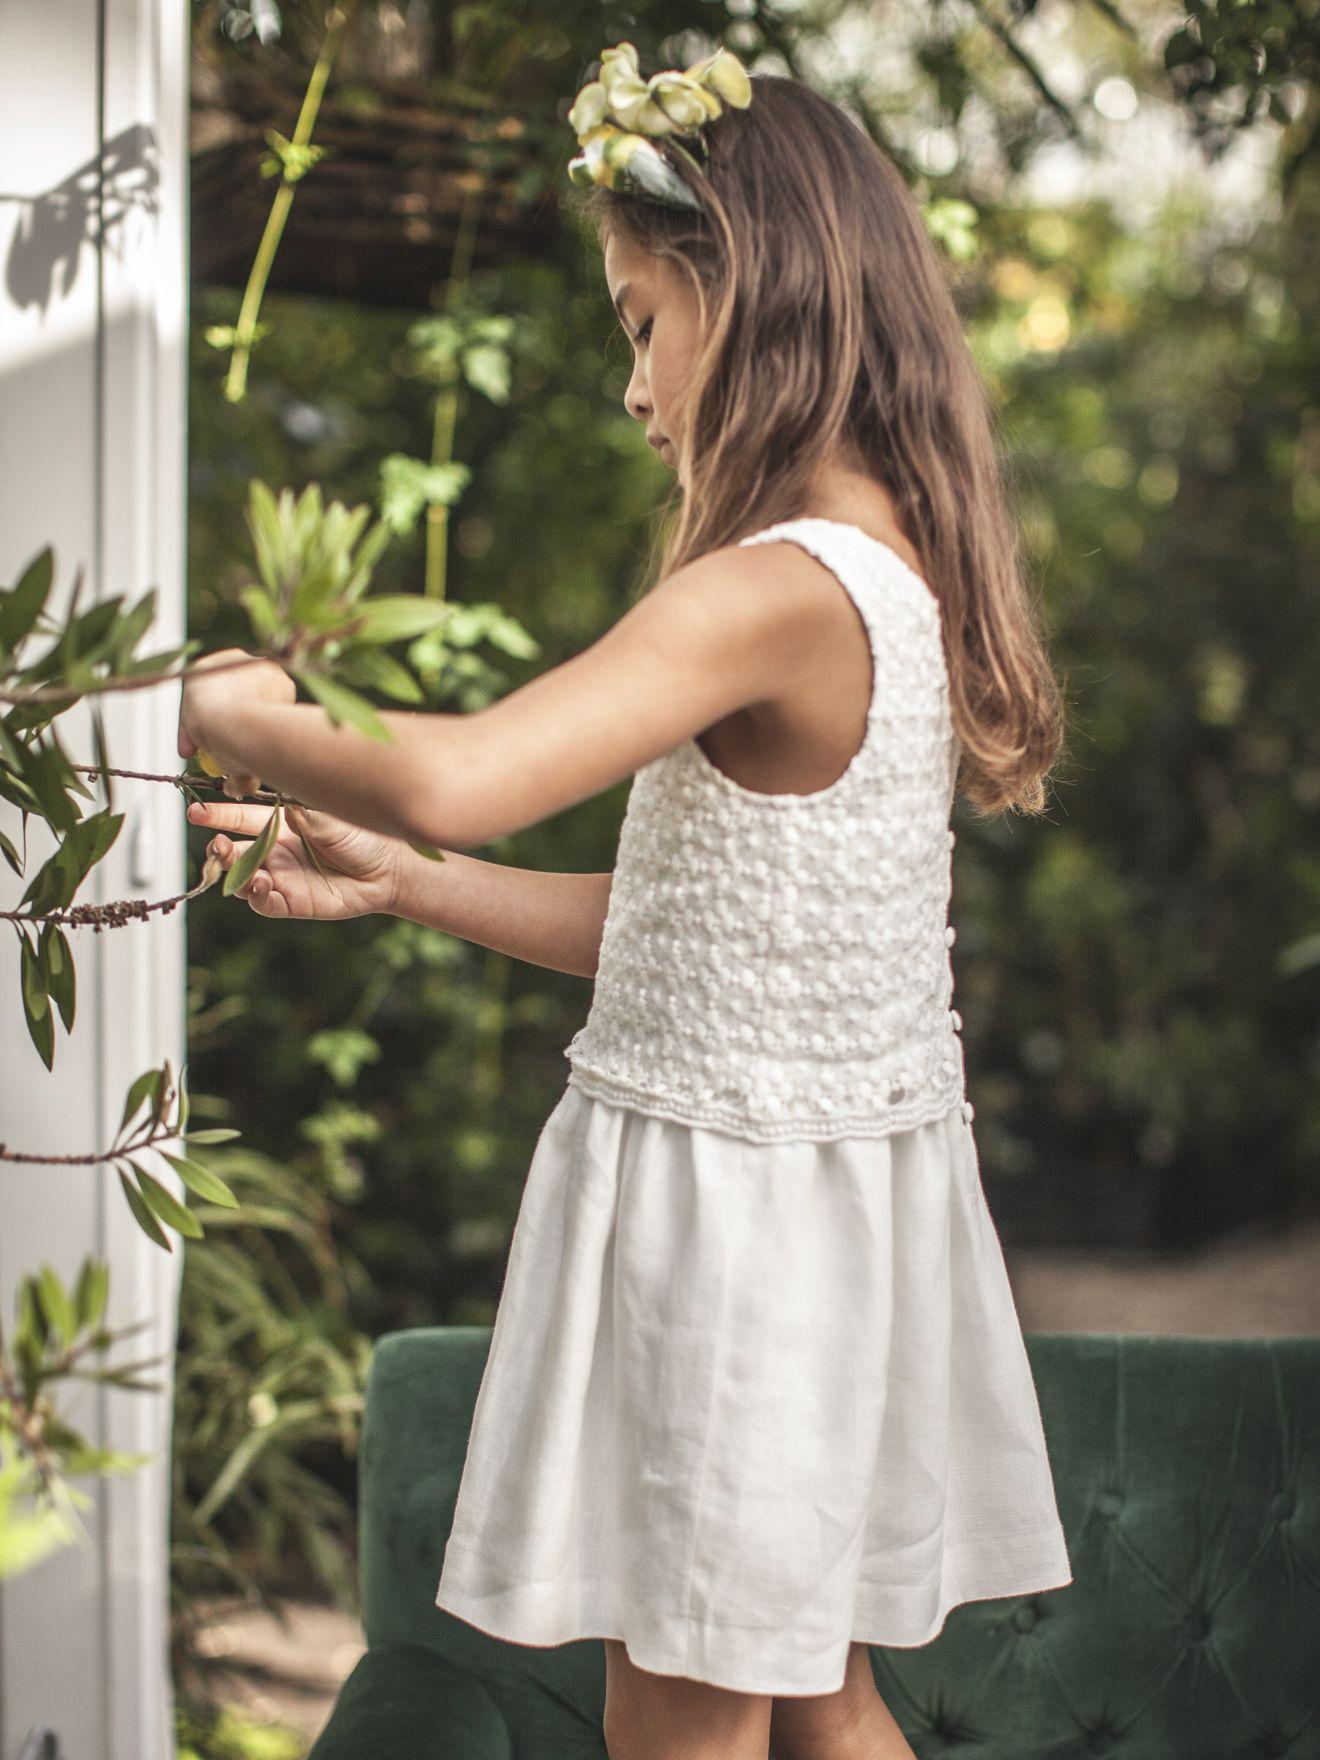 Gap robe blanche fille